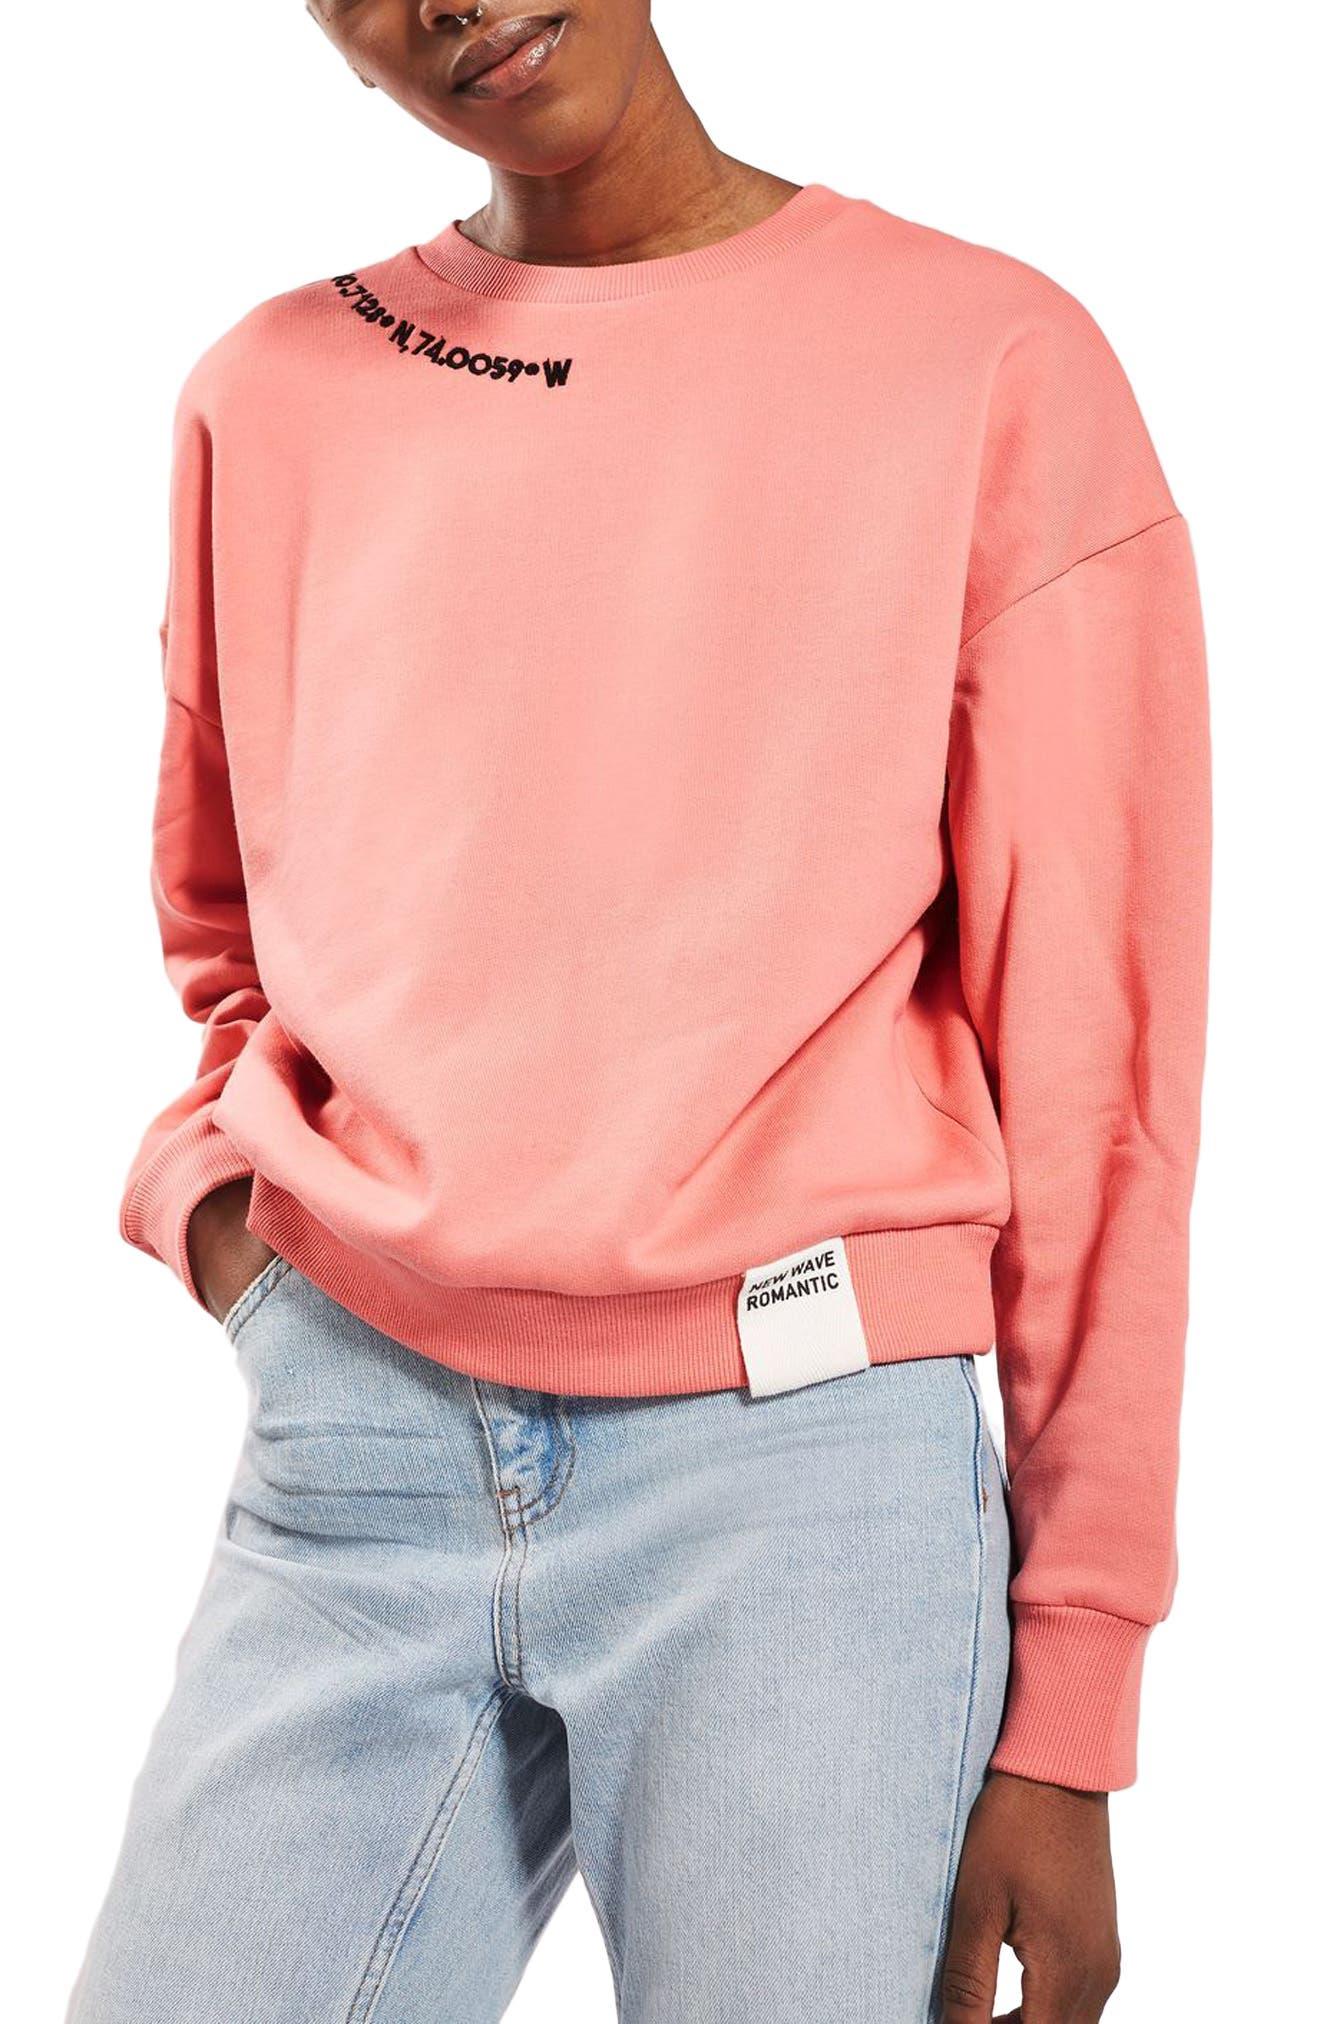 Main Image - Topshop Romance Sweatshirt